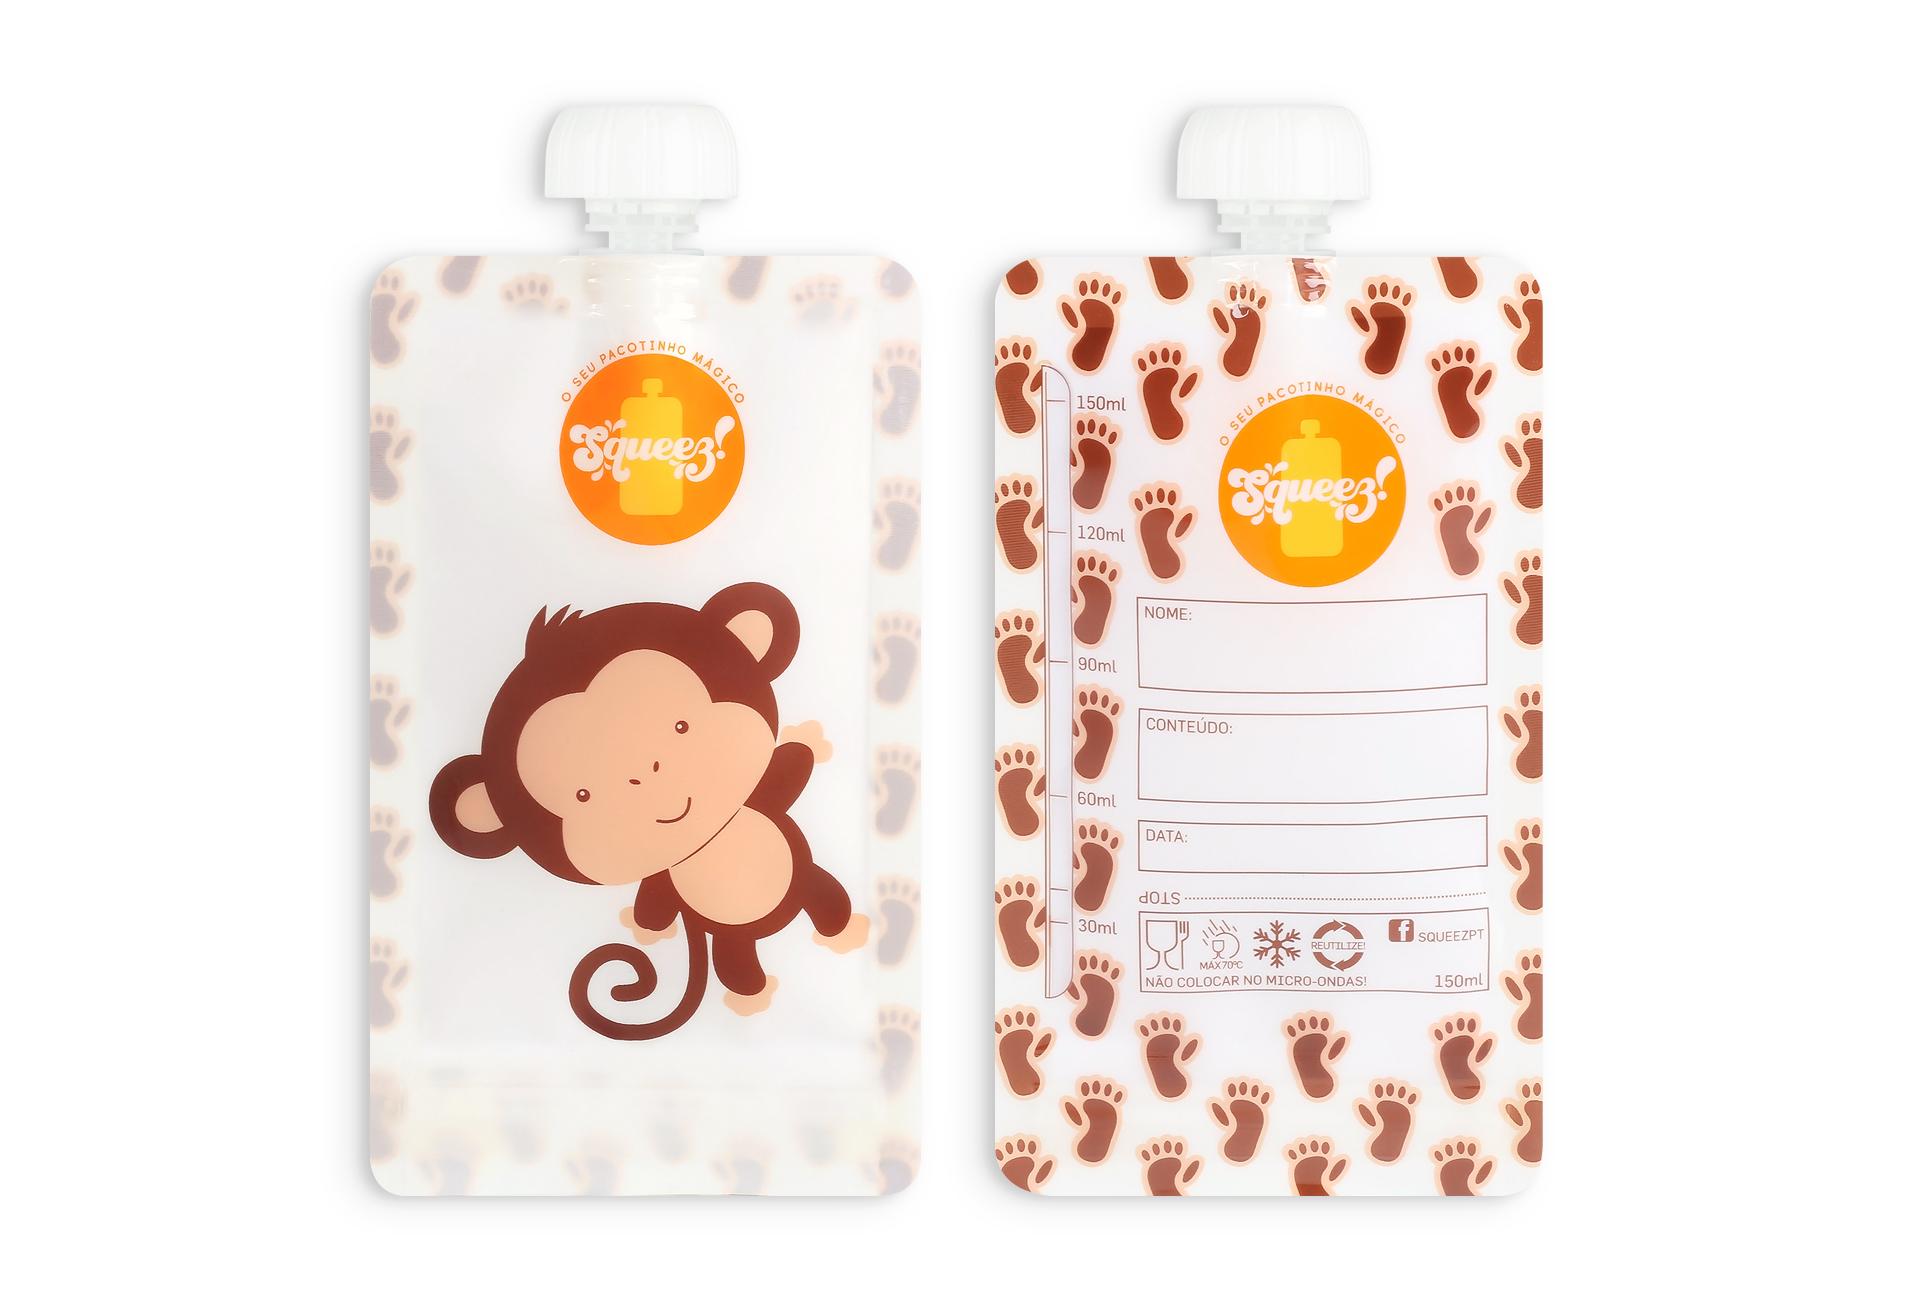 Pack 4 Pacotes reutilizáveis Squeez! 2 Girafas + 2  Elefante ou 2 Macacos 150ml